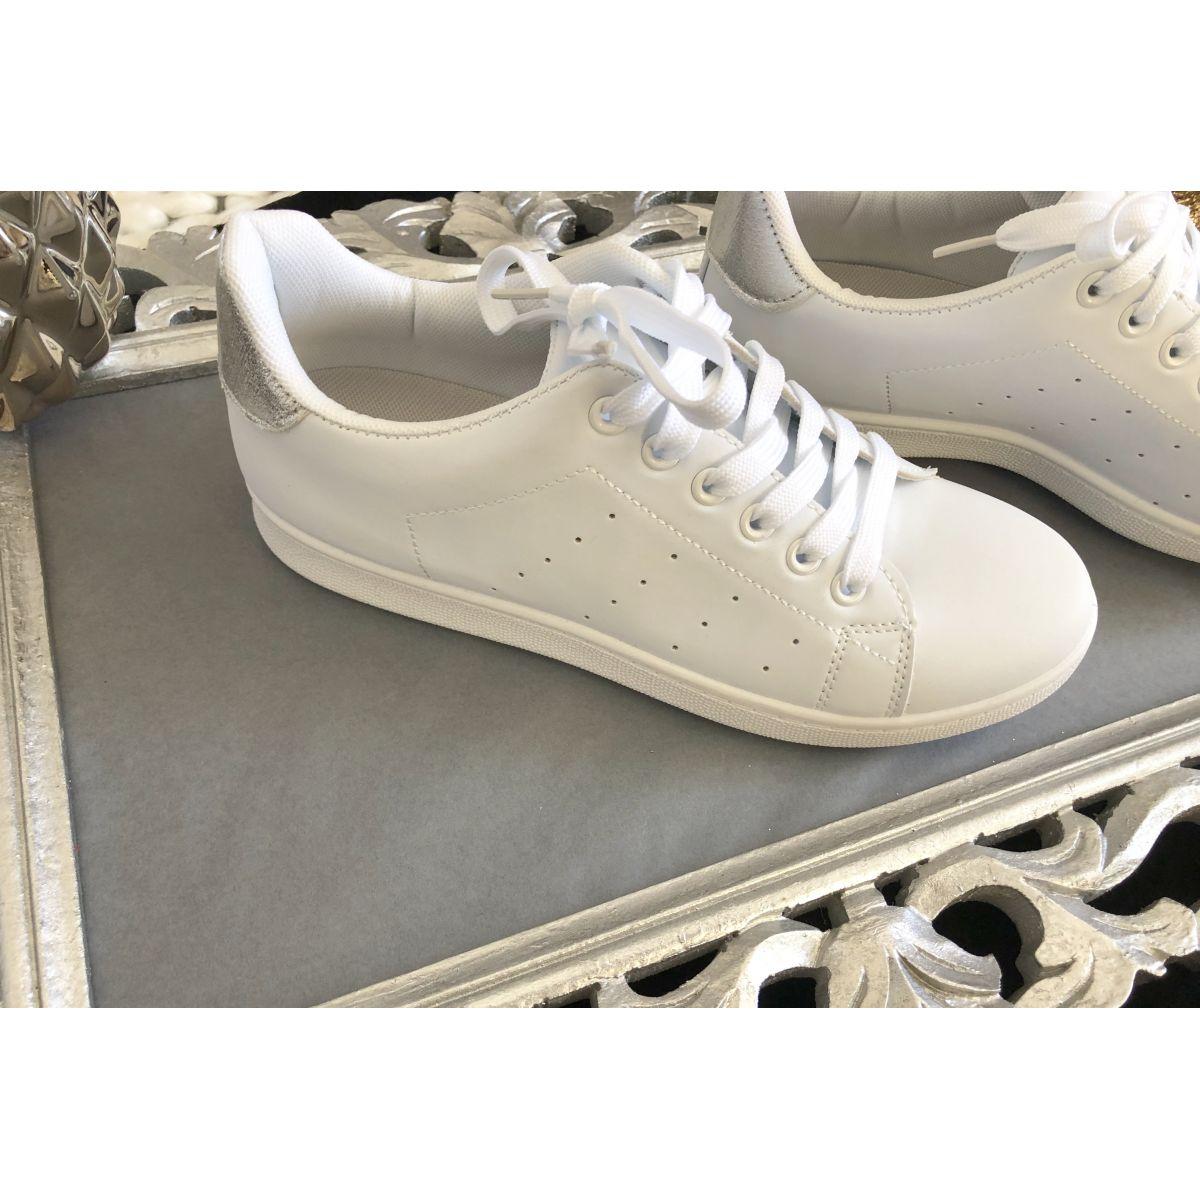 Basket stass blanche détail sylver